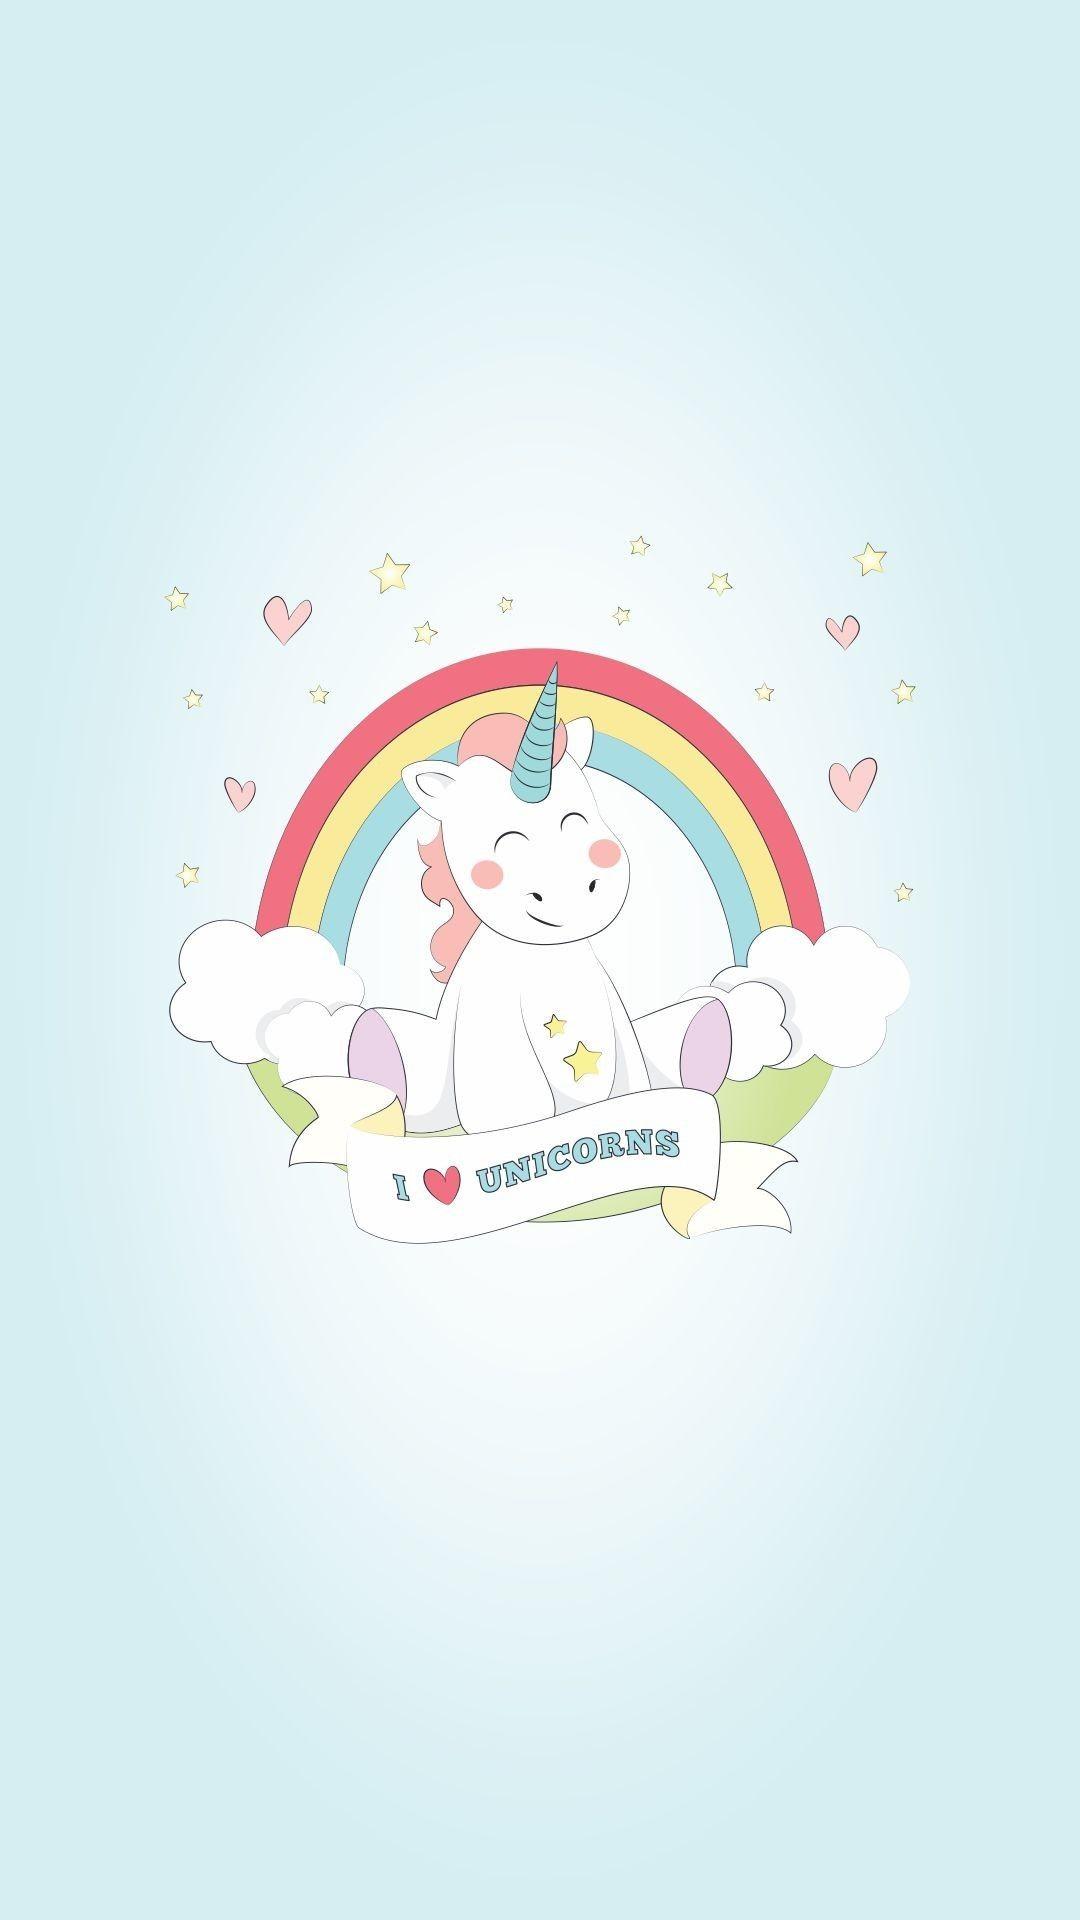 Res: 1080x1920, Kawaii Unicorn Wallpaper 69+ - xshyfc.com